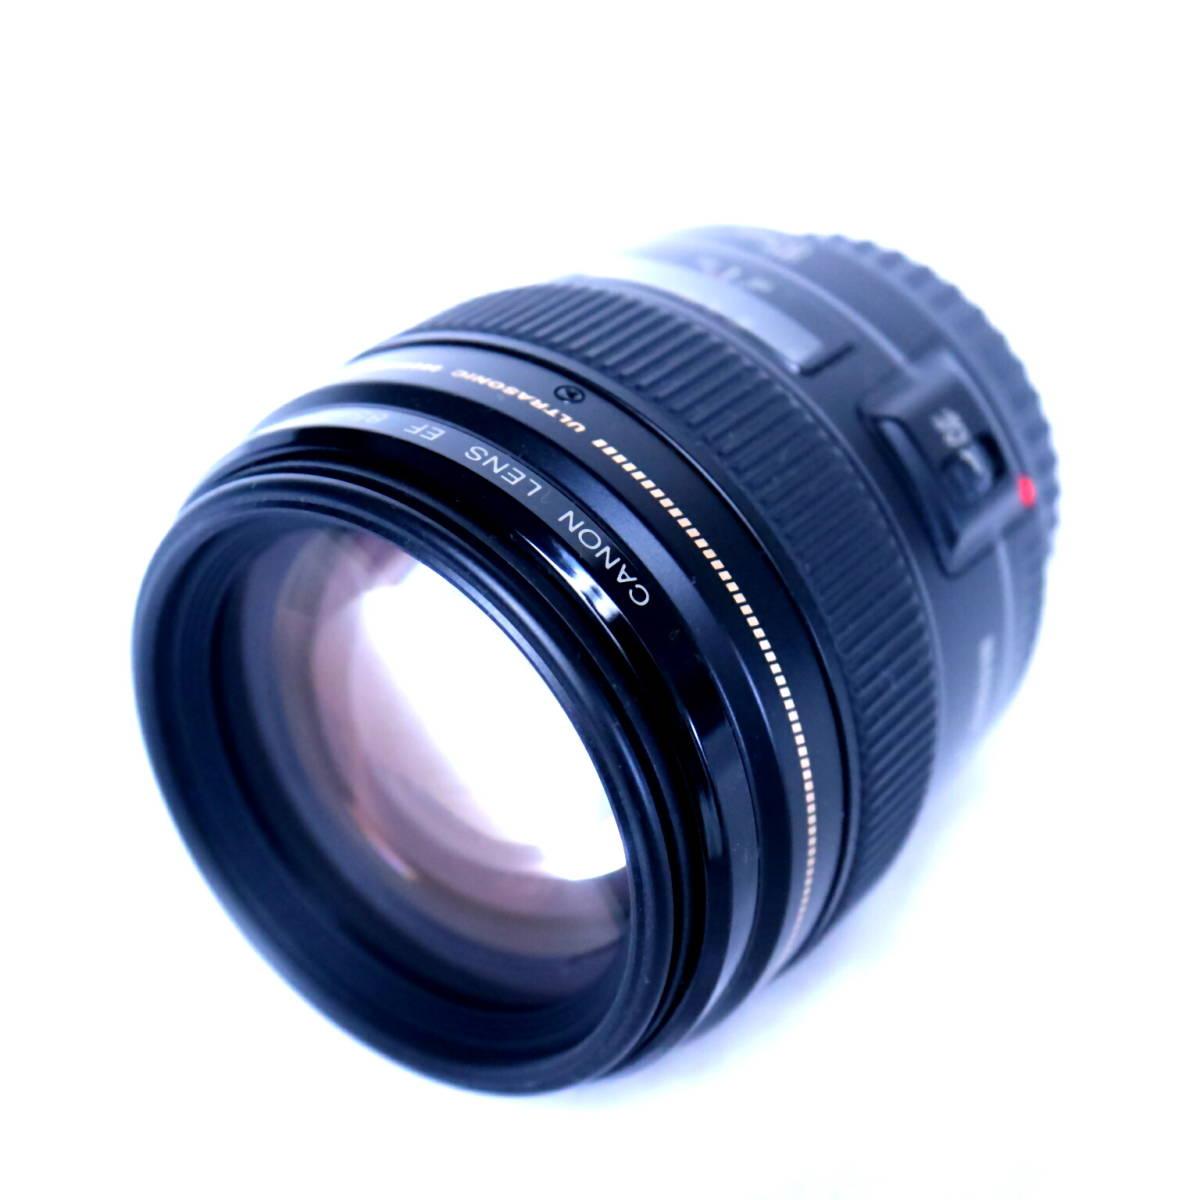 Canon EF85mm f1.8 USM 【極美品】ワンオーナー品 フルサイズ対応 高性能単焦点レンズ キヤノン_画像3